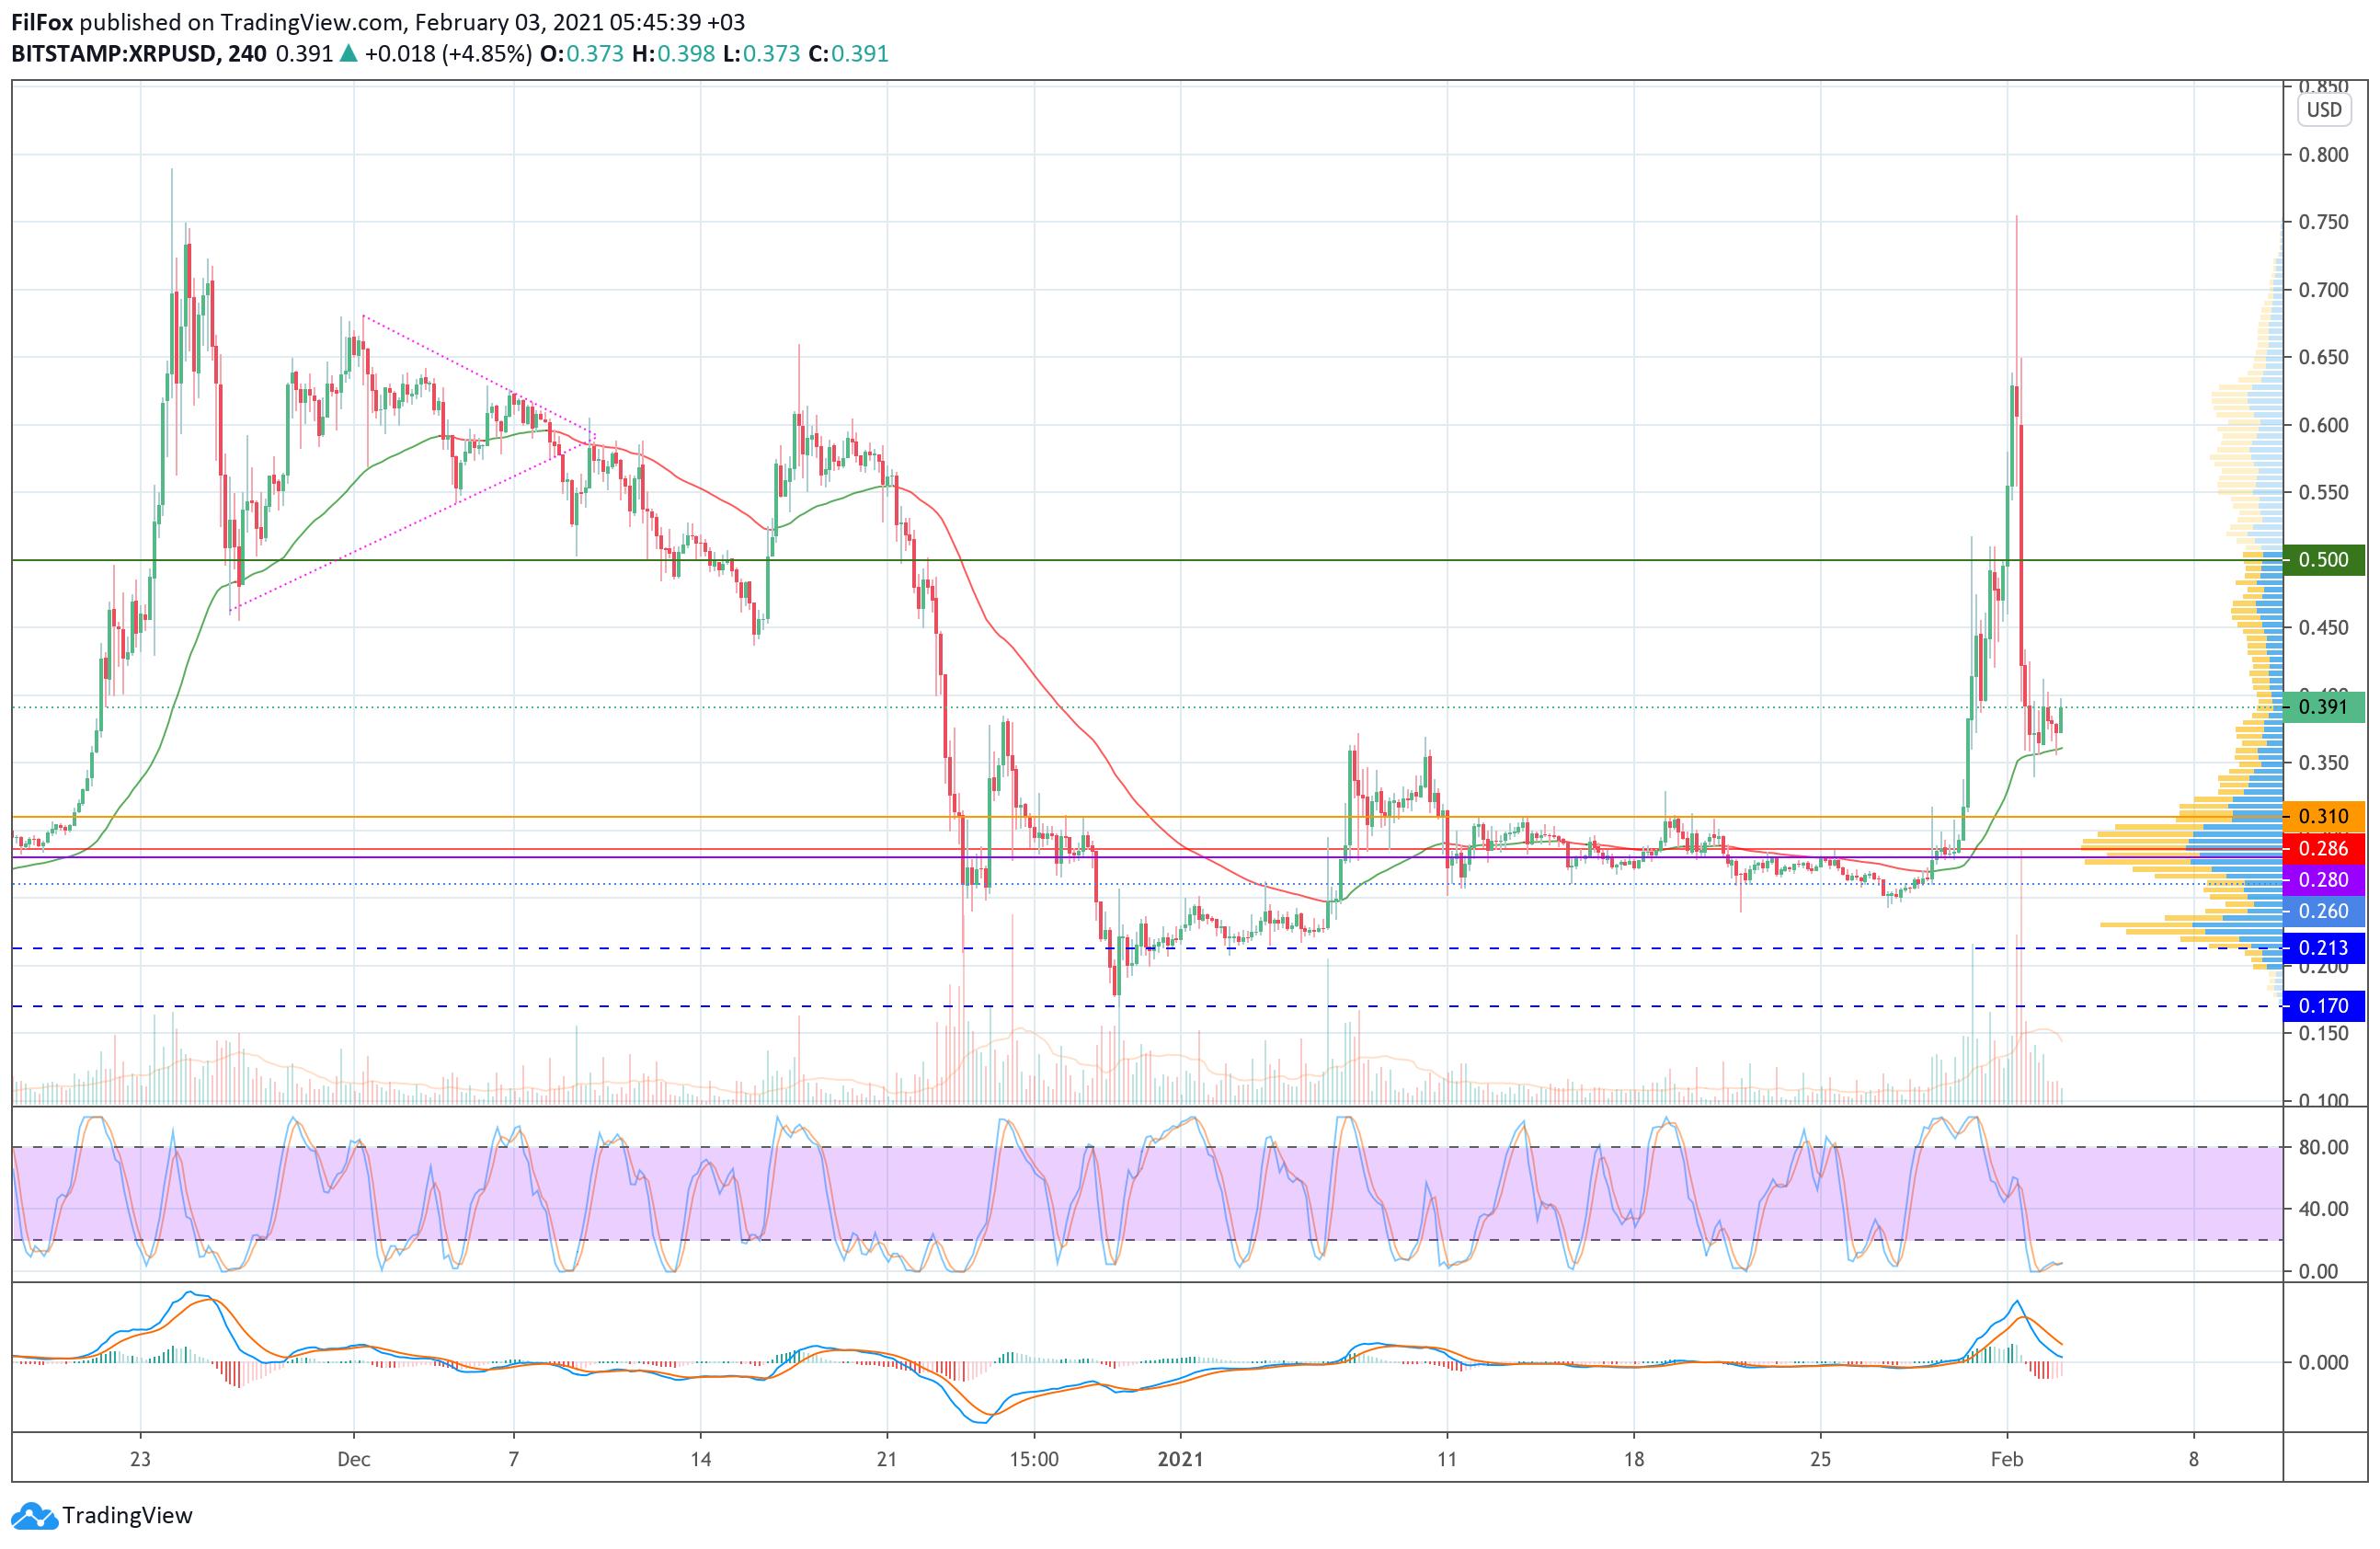 Анализ цен Bitcoin, Ethereum, Ripple на 03.02.2021